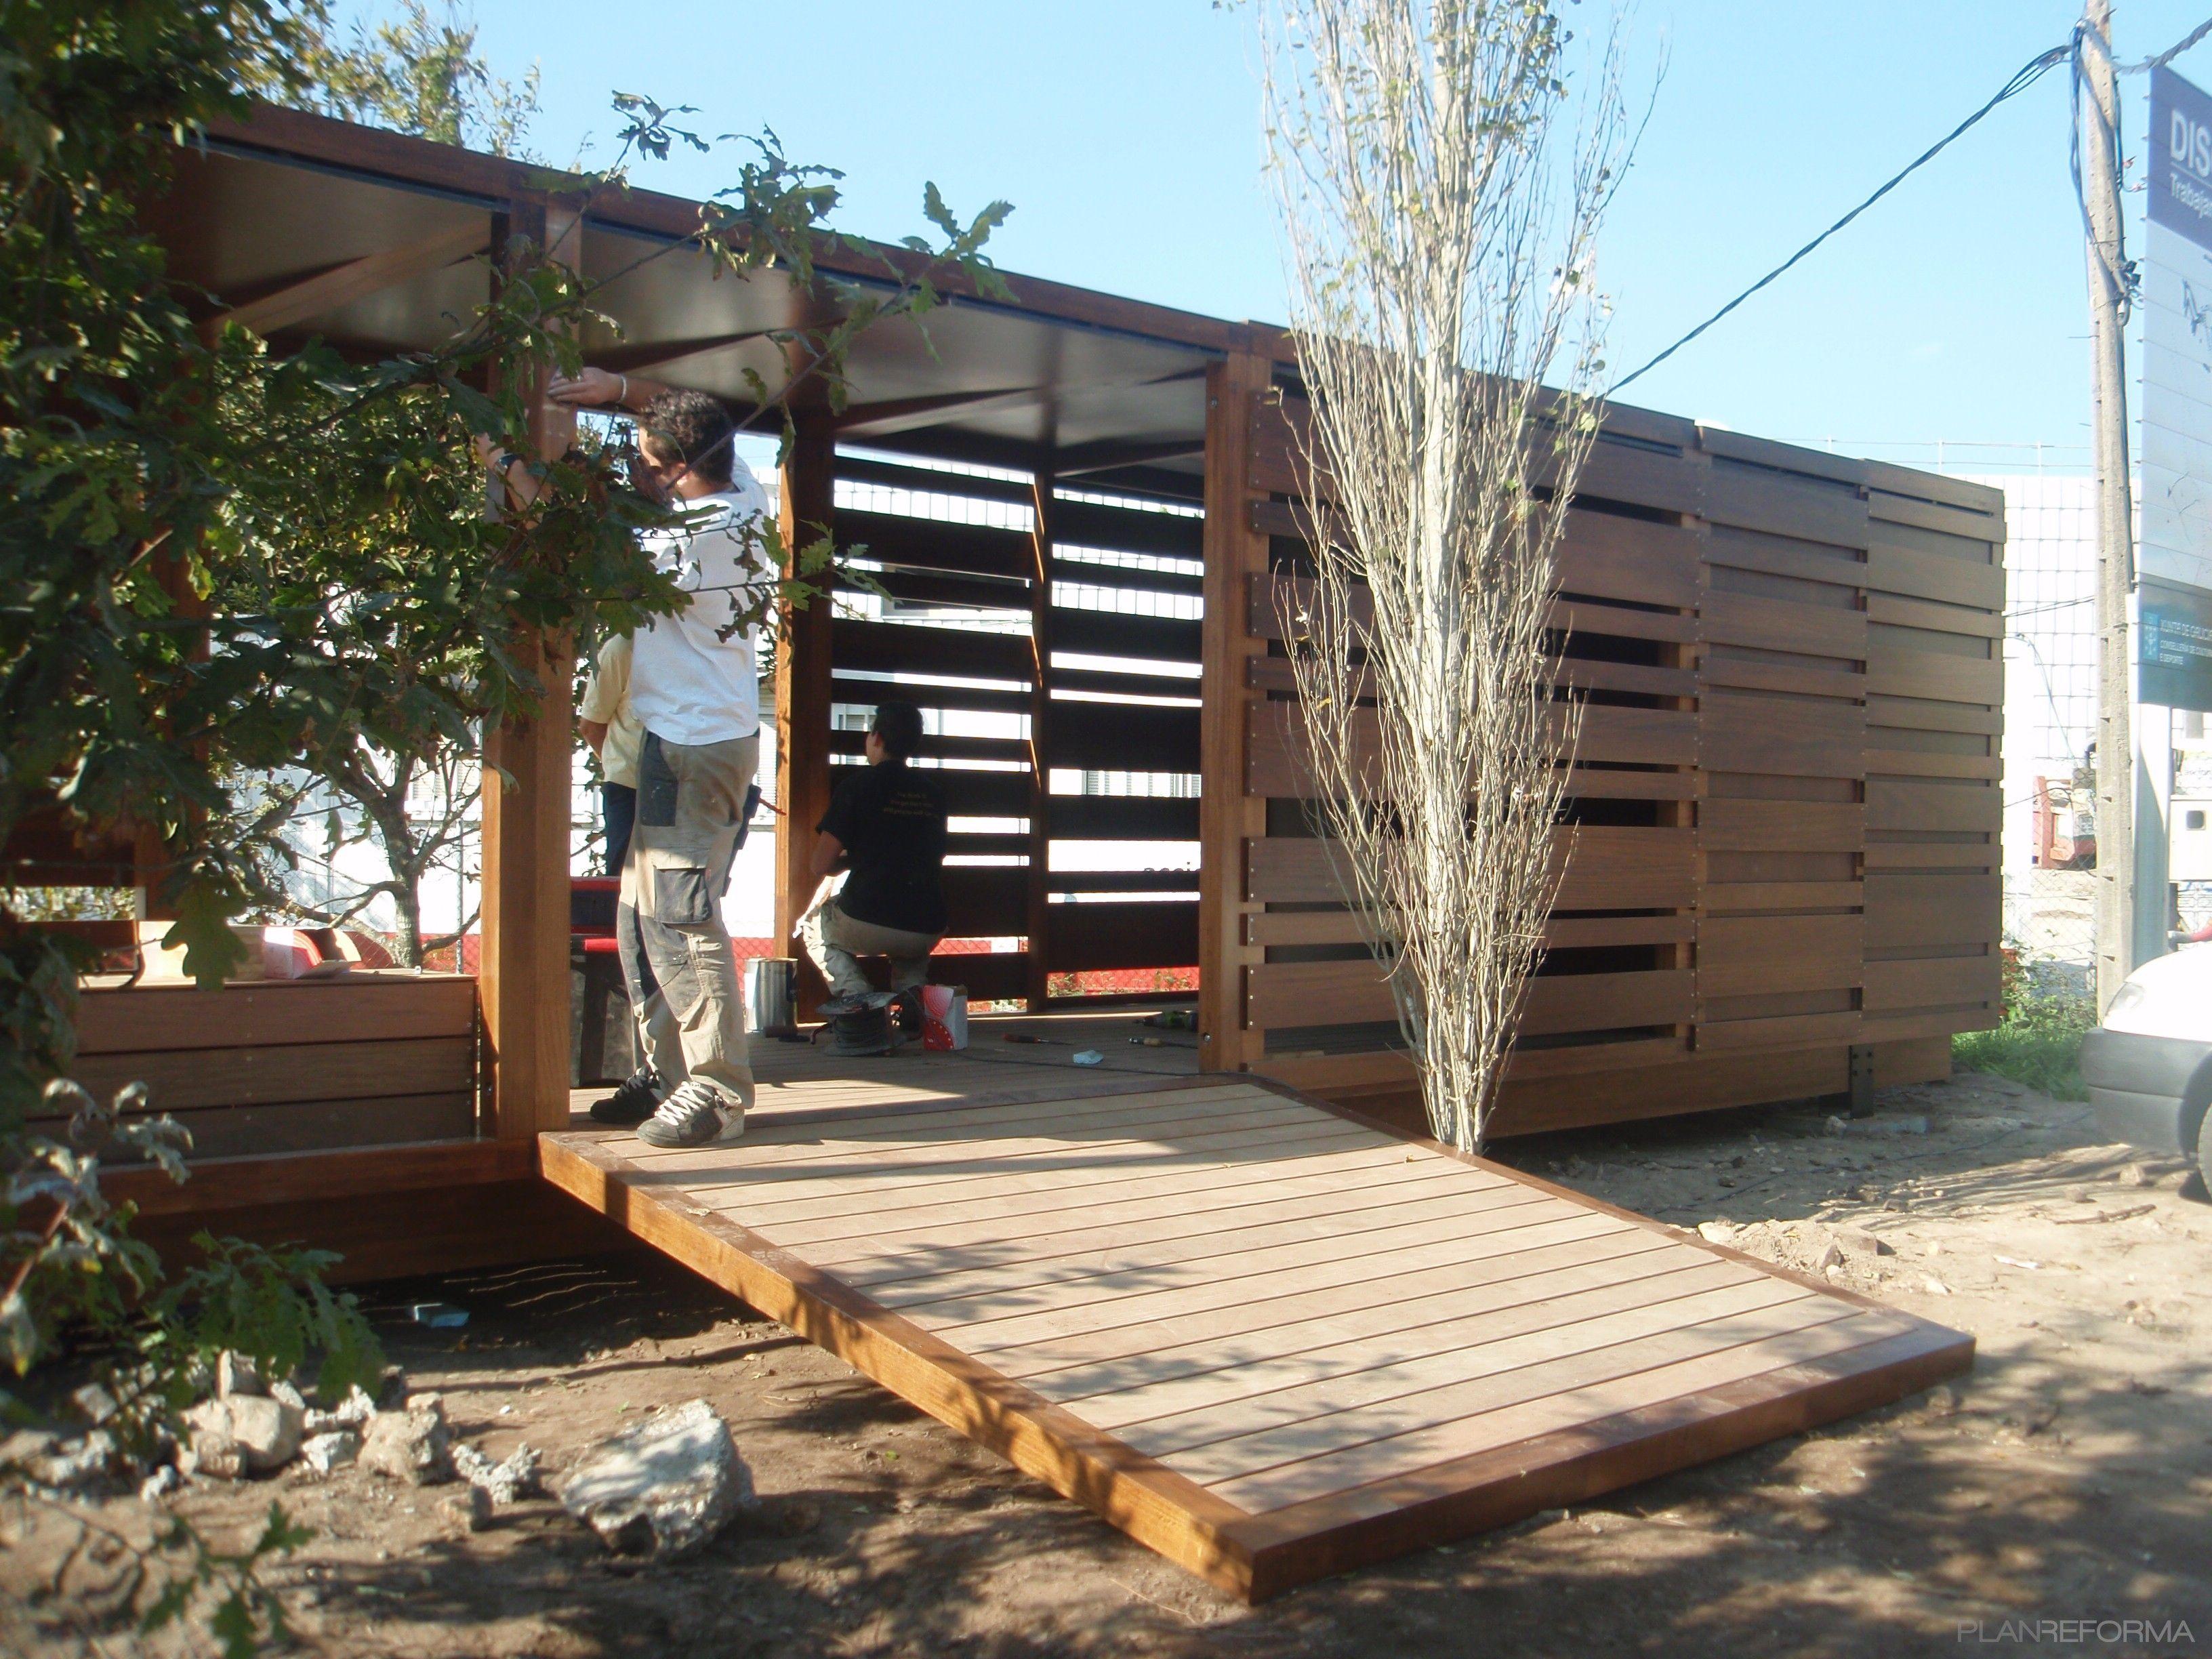 Ideas De Paisajismo Exterior Jardin Estilo Vanguardista Dise Ado  # Muebles Fuentes Carballo